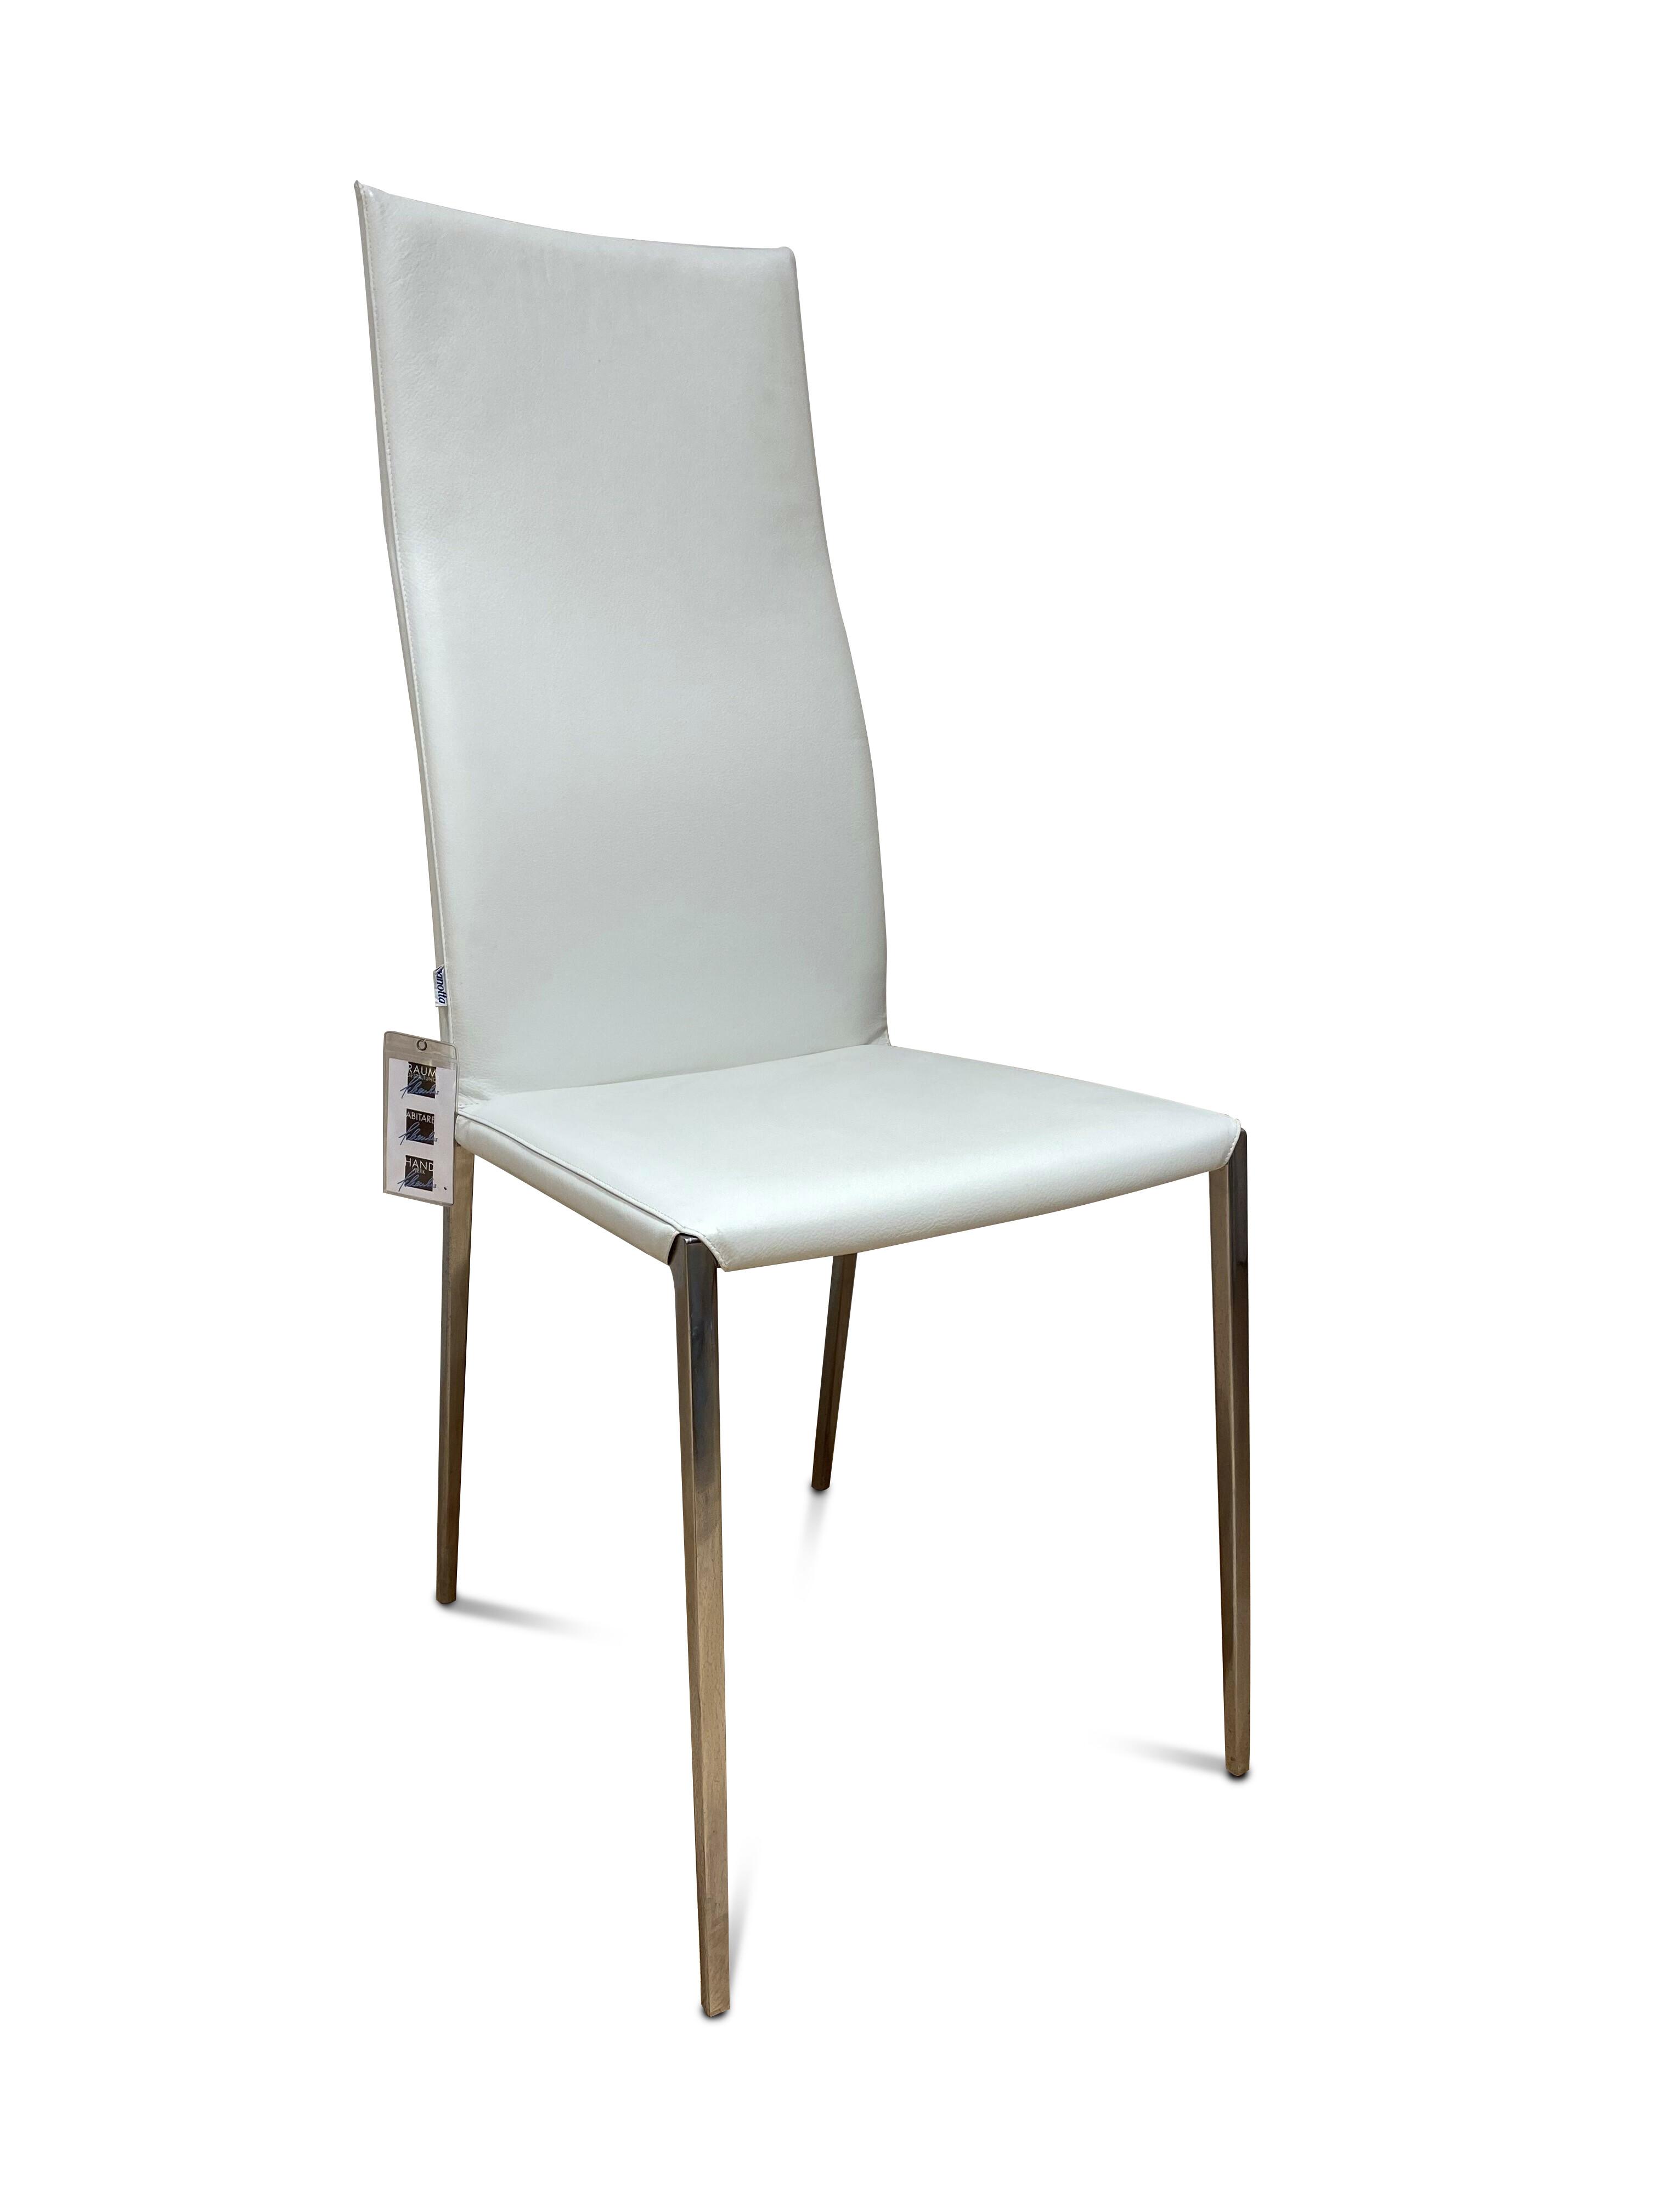 Zanotta Stühle Modell Lialta 6 Stück 02